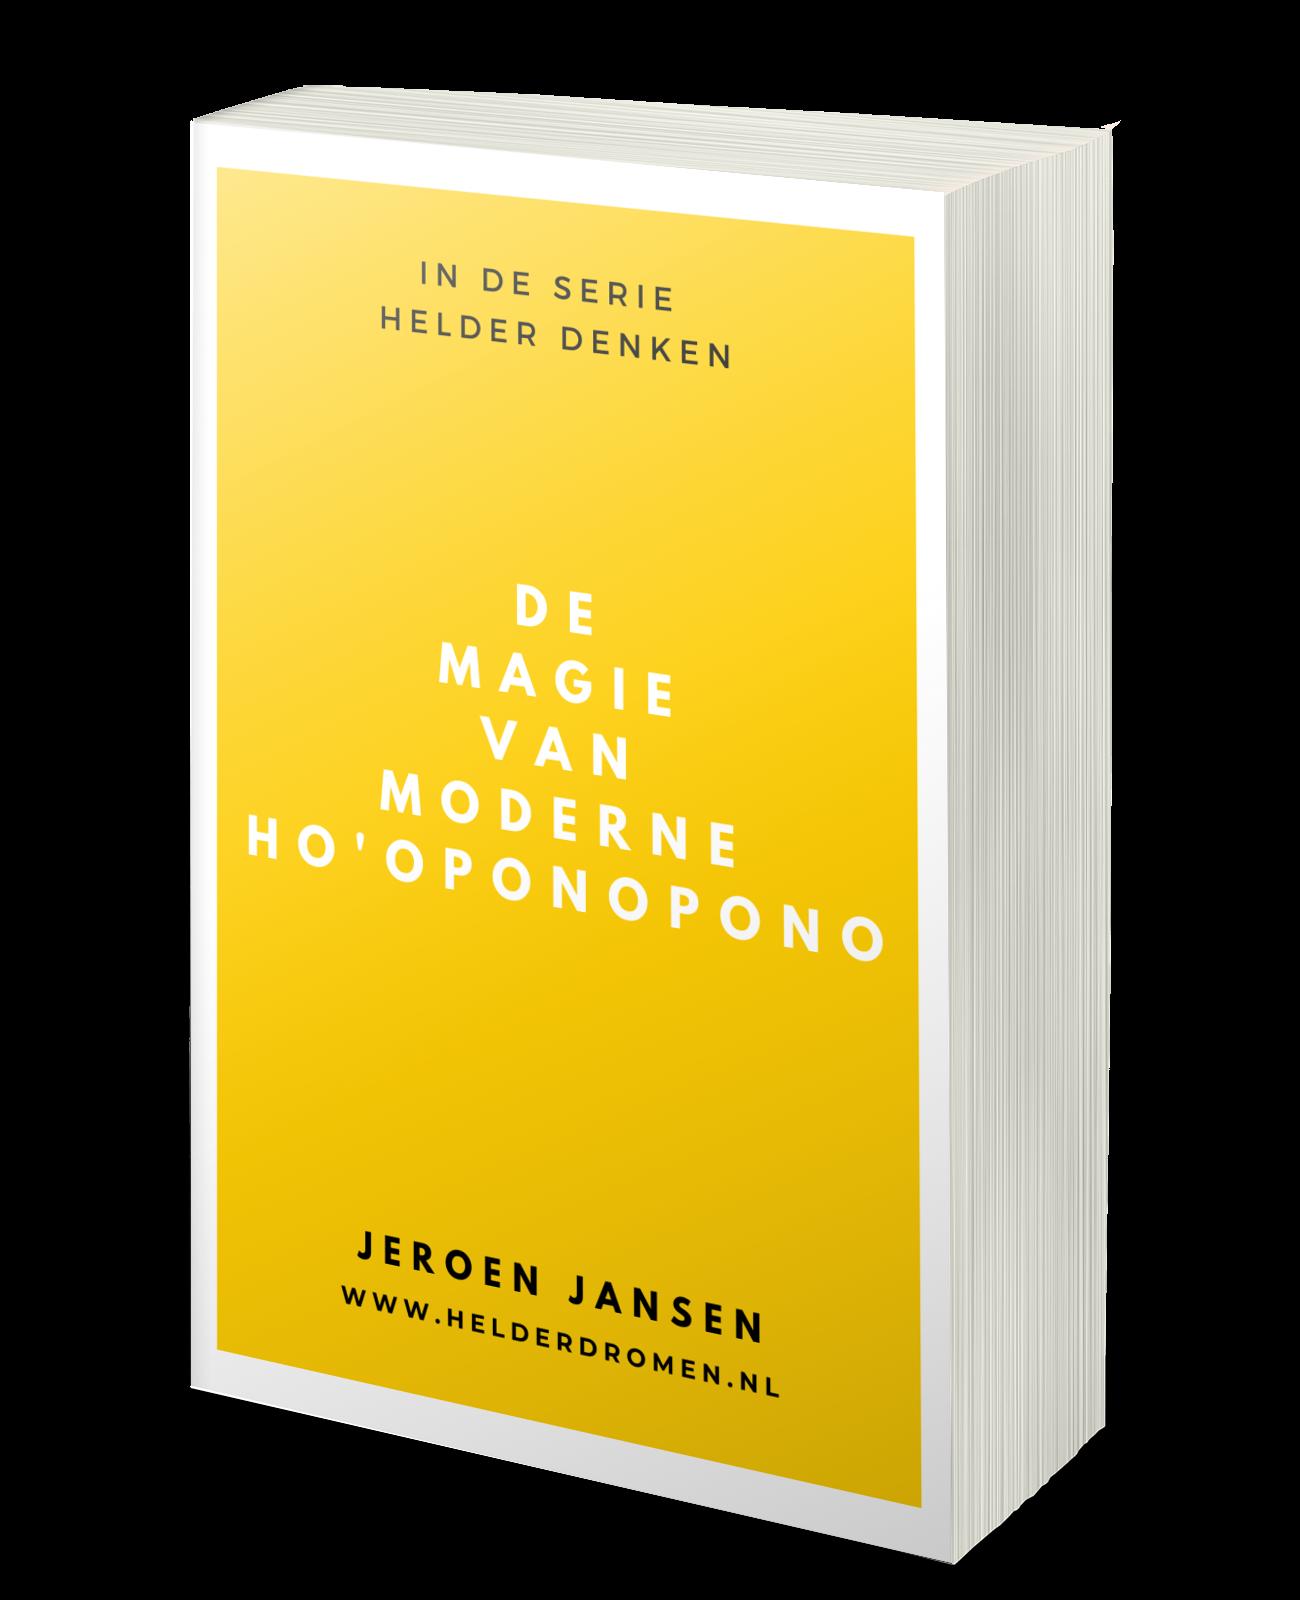 De Magie van Moderne Ho'oponopono